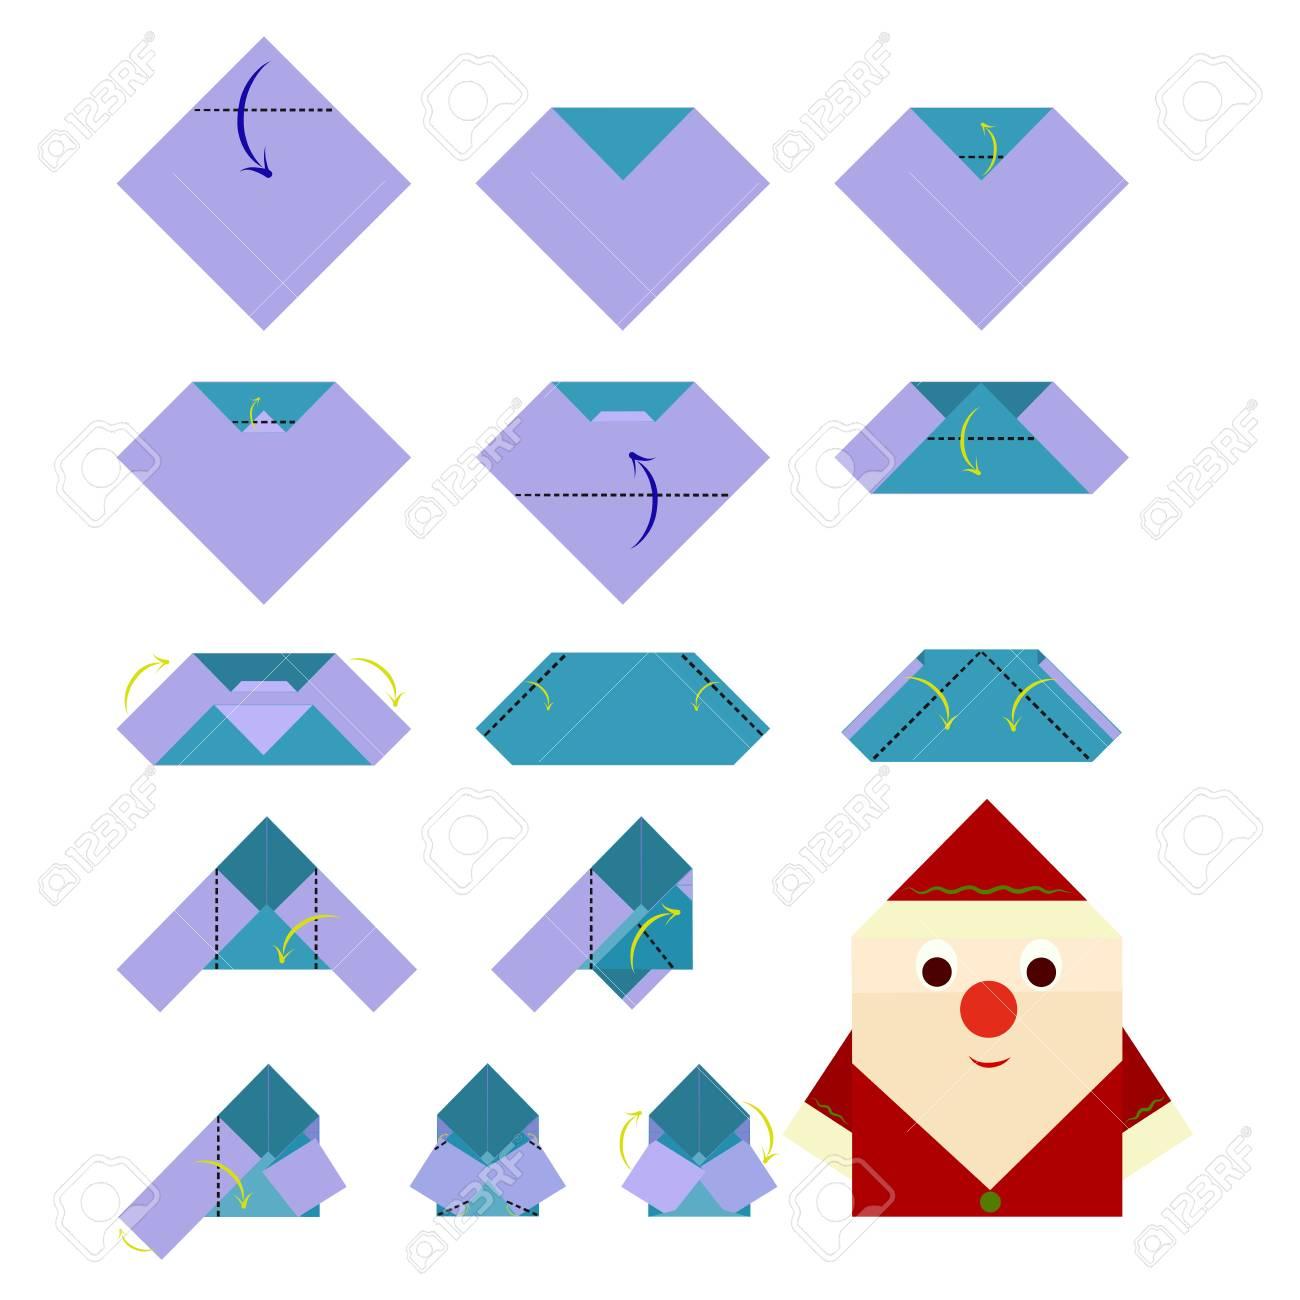 How to make Santa Claus, origami - 121858304